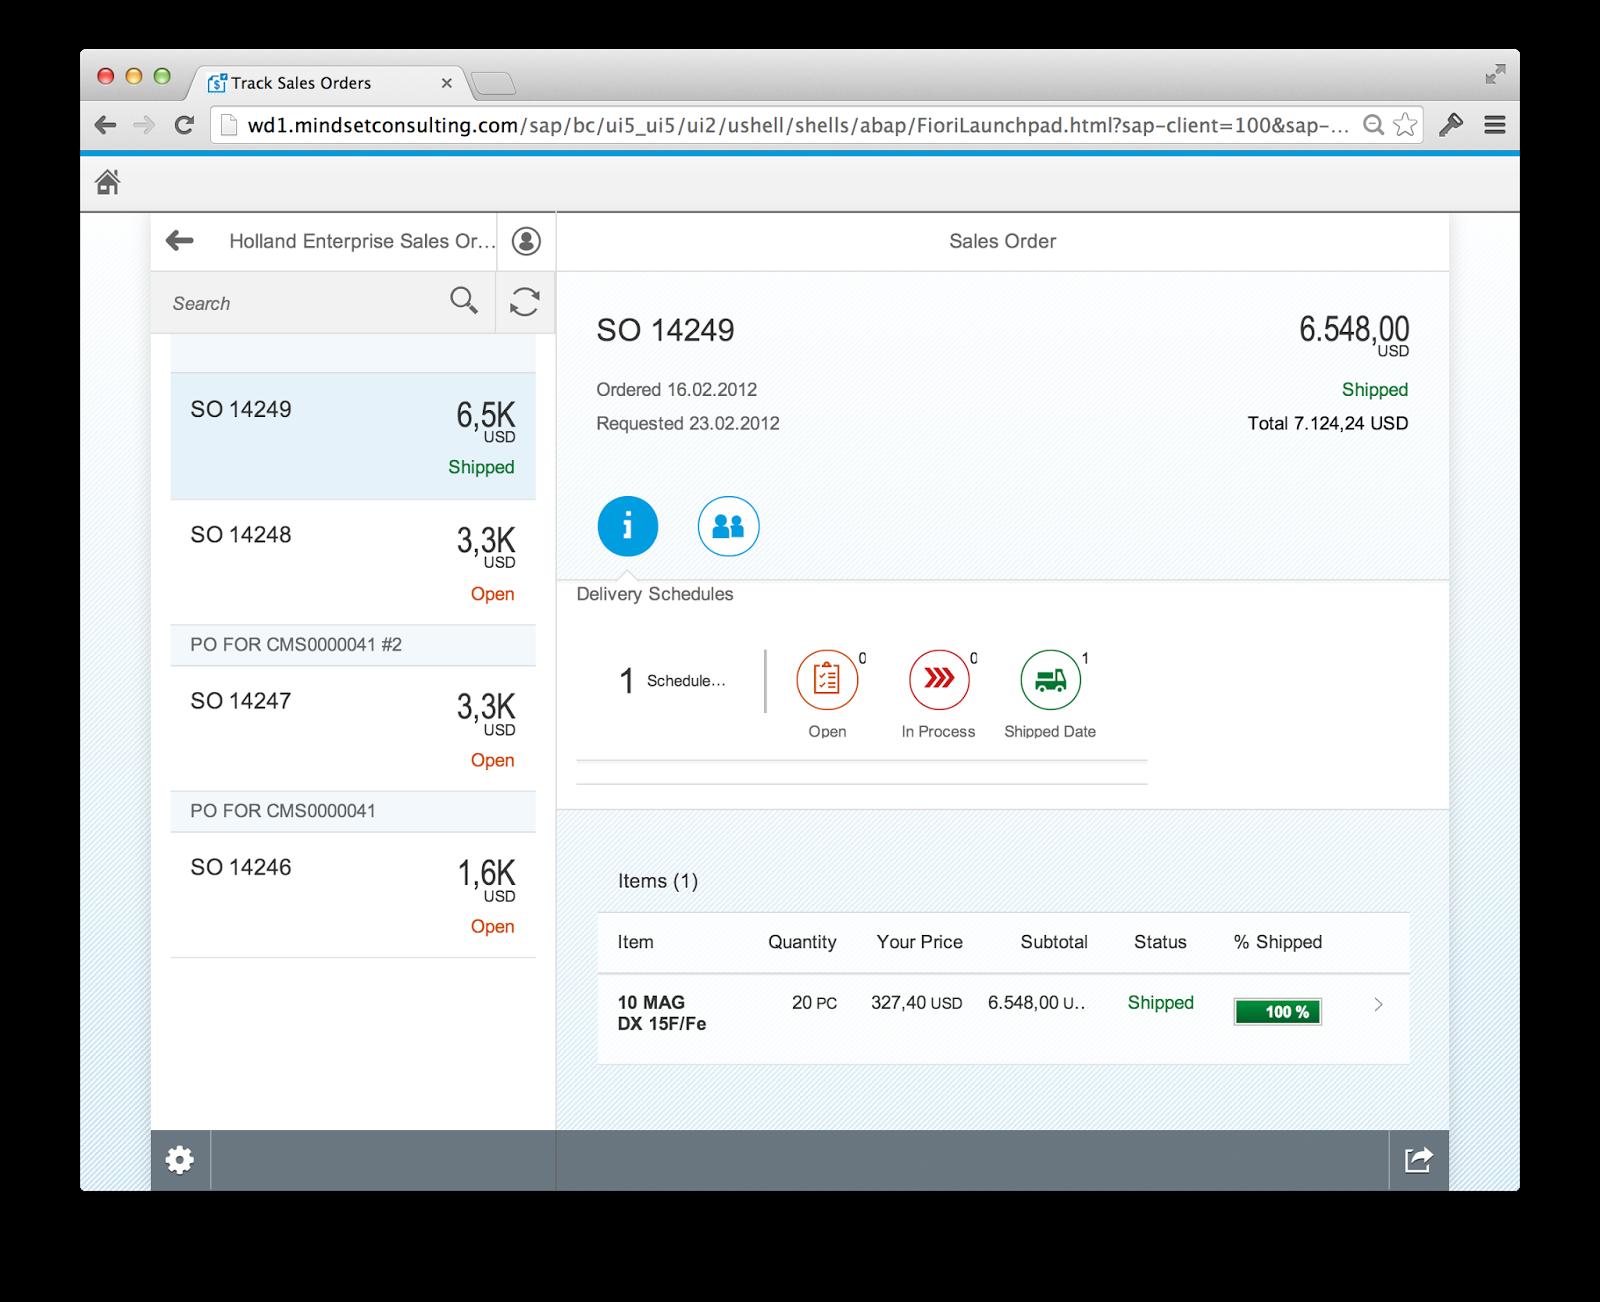 SAP Fiori Track Sales Order